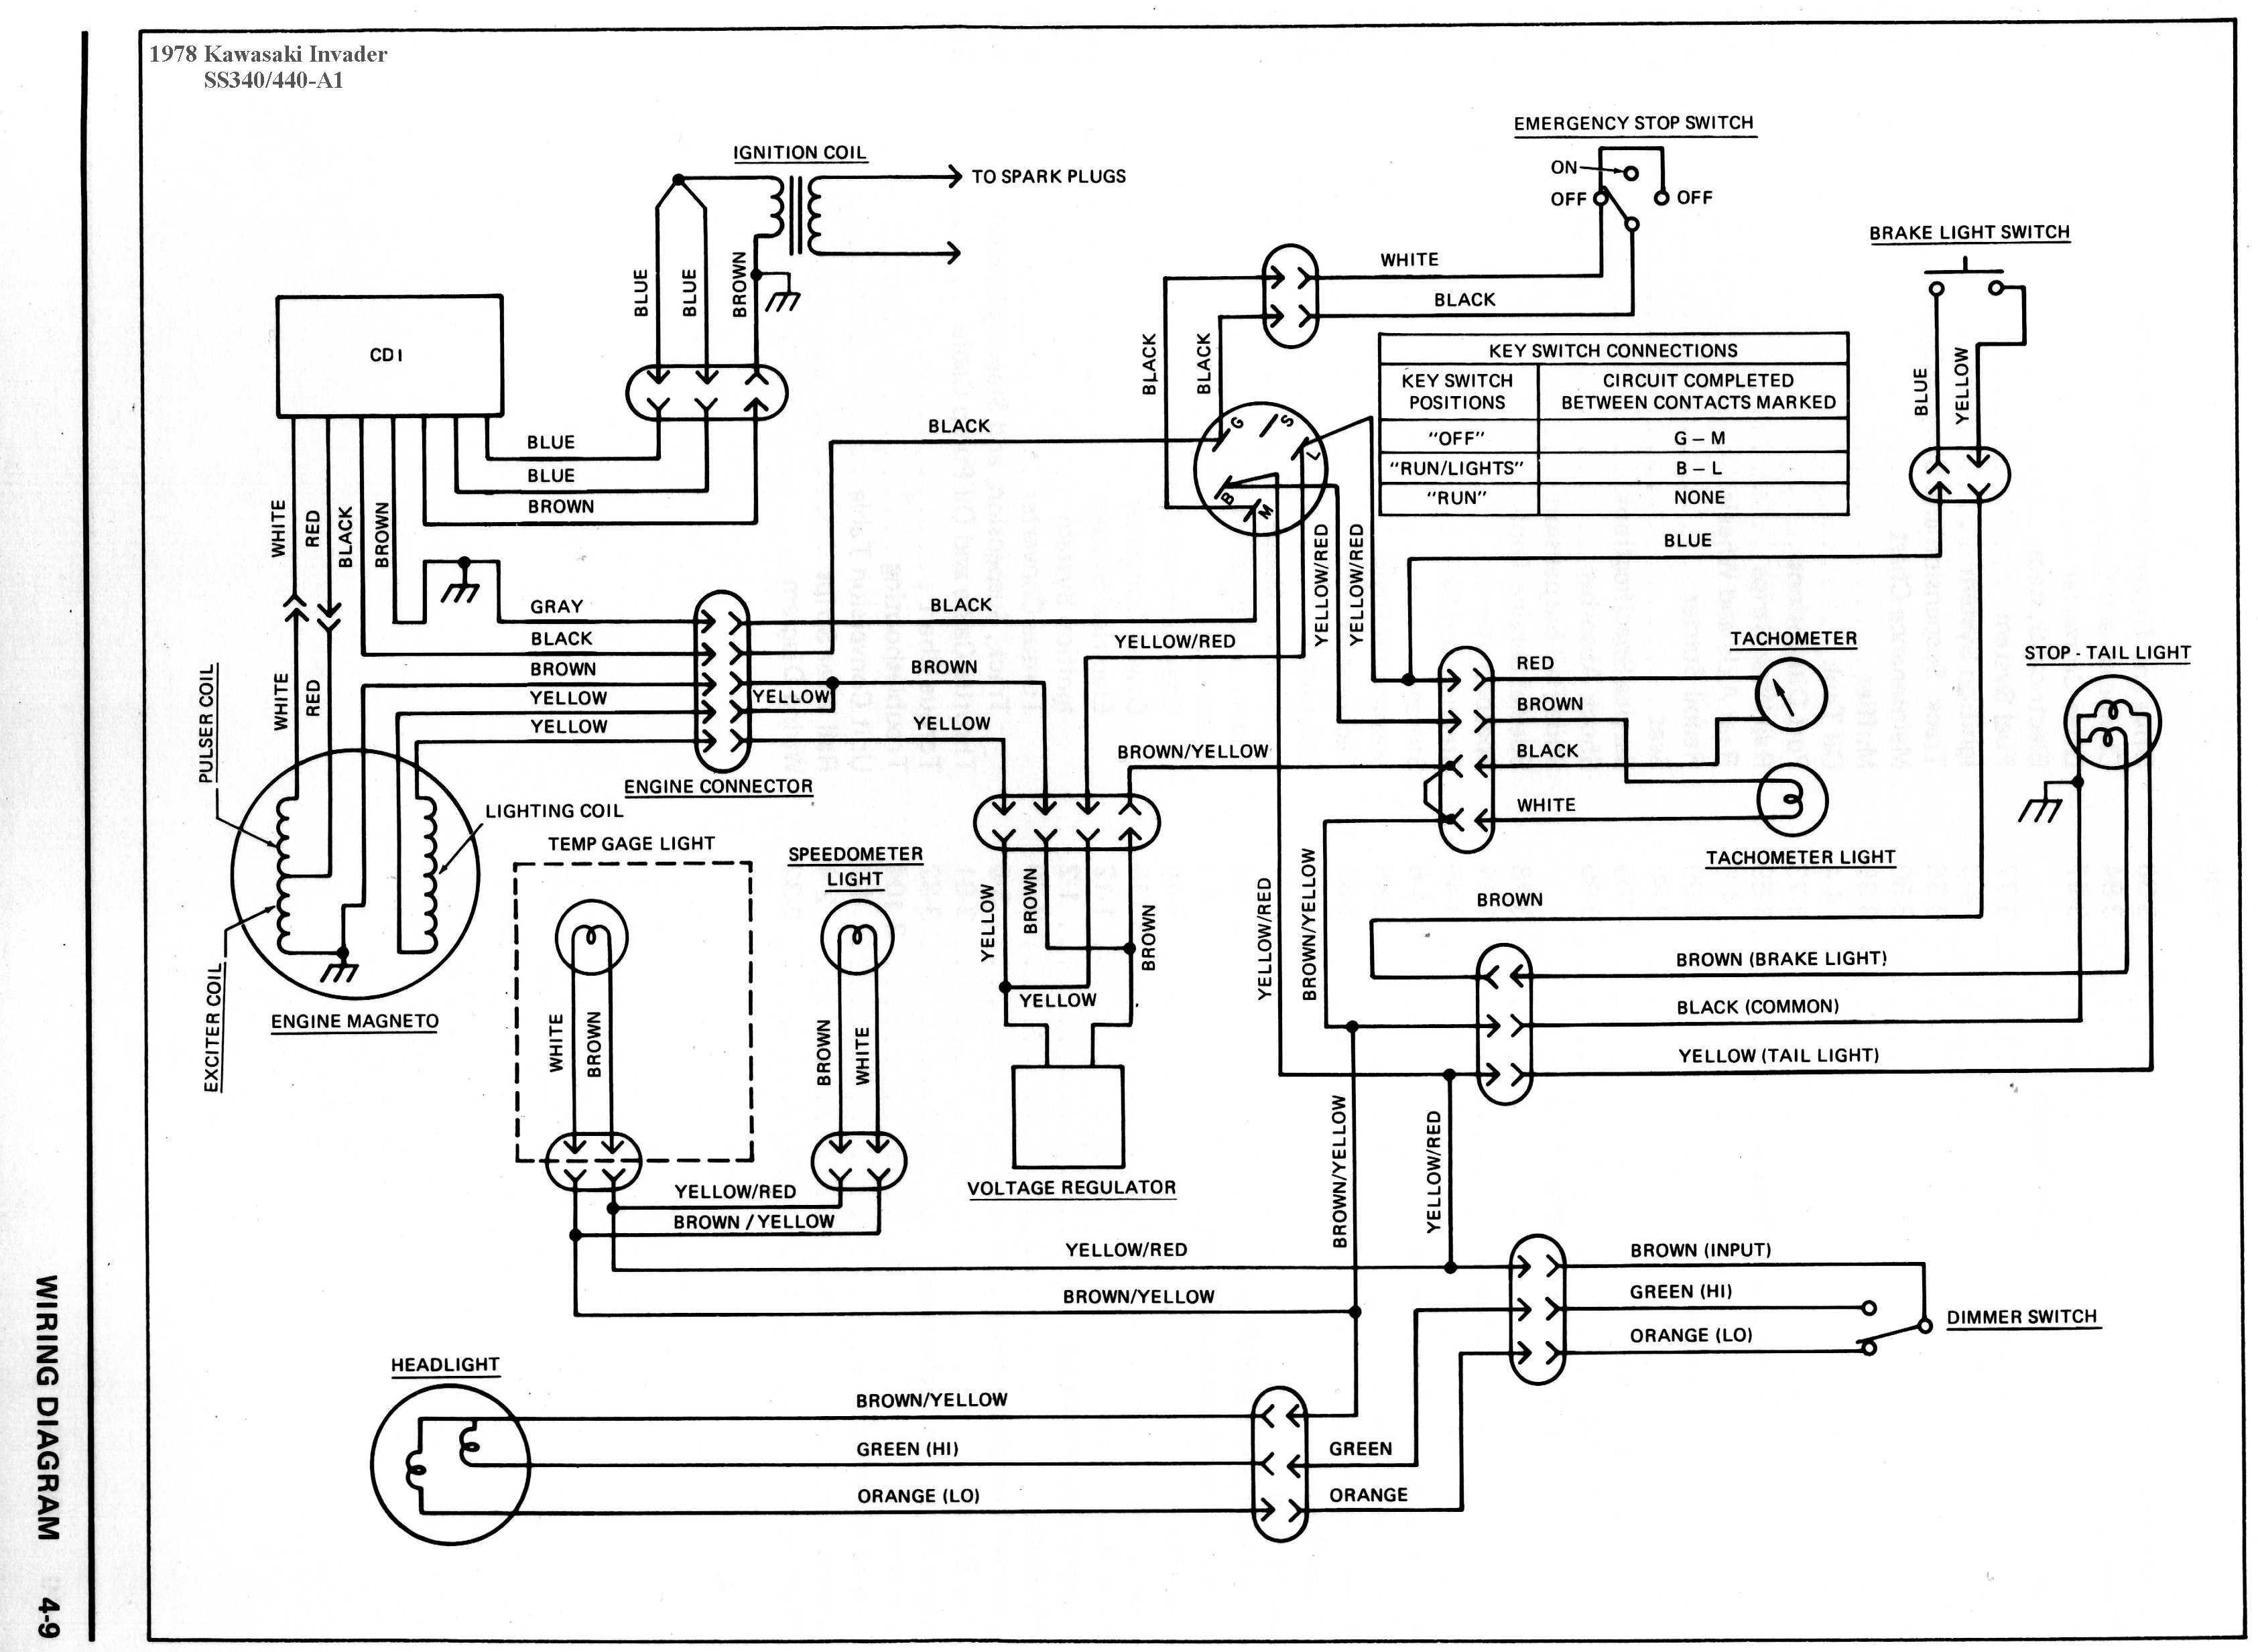 Kawasaki Mule Wiring Harness - Wiring Diagram Srconds on